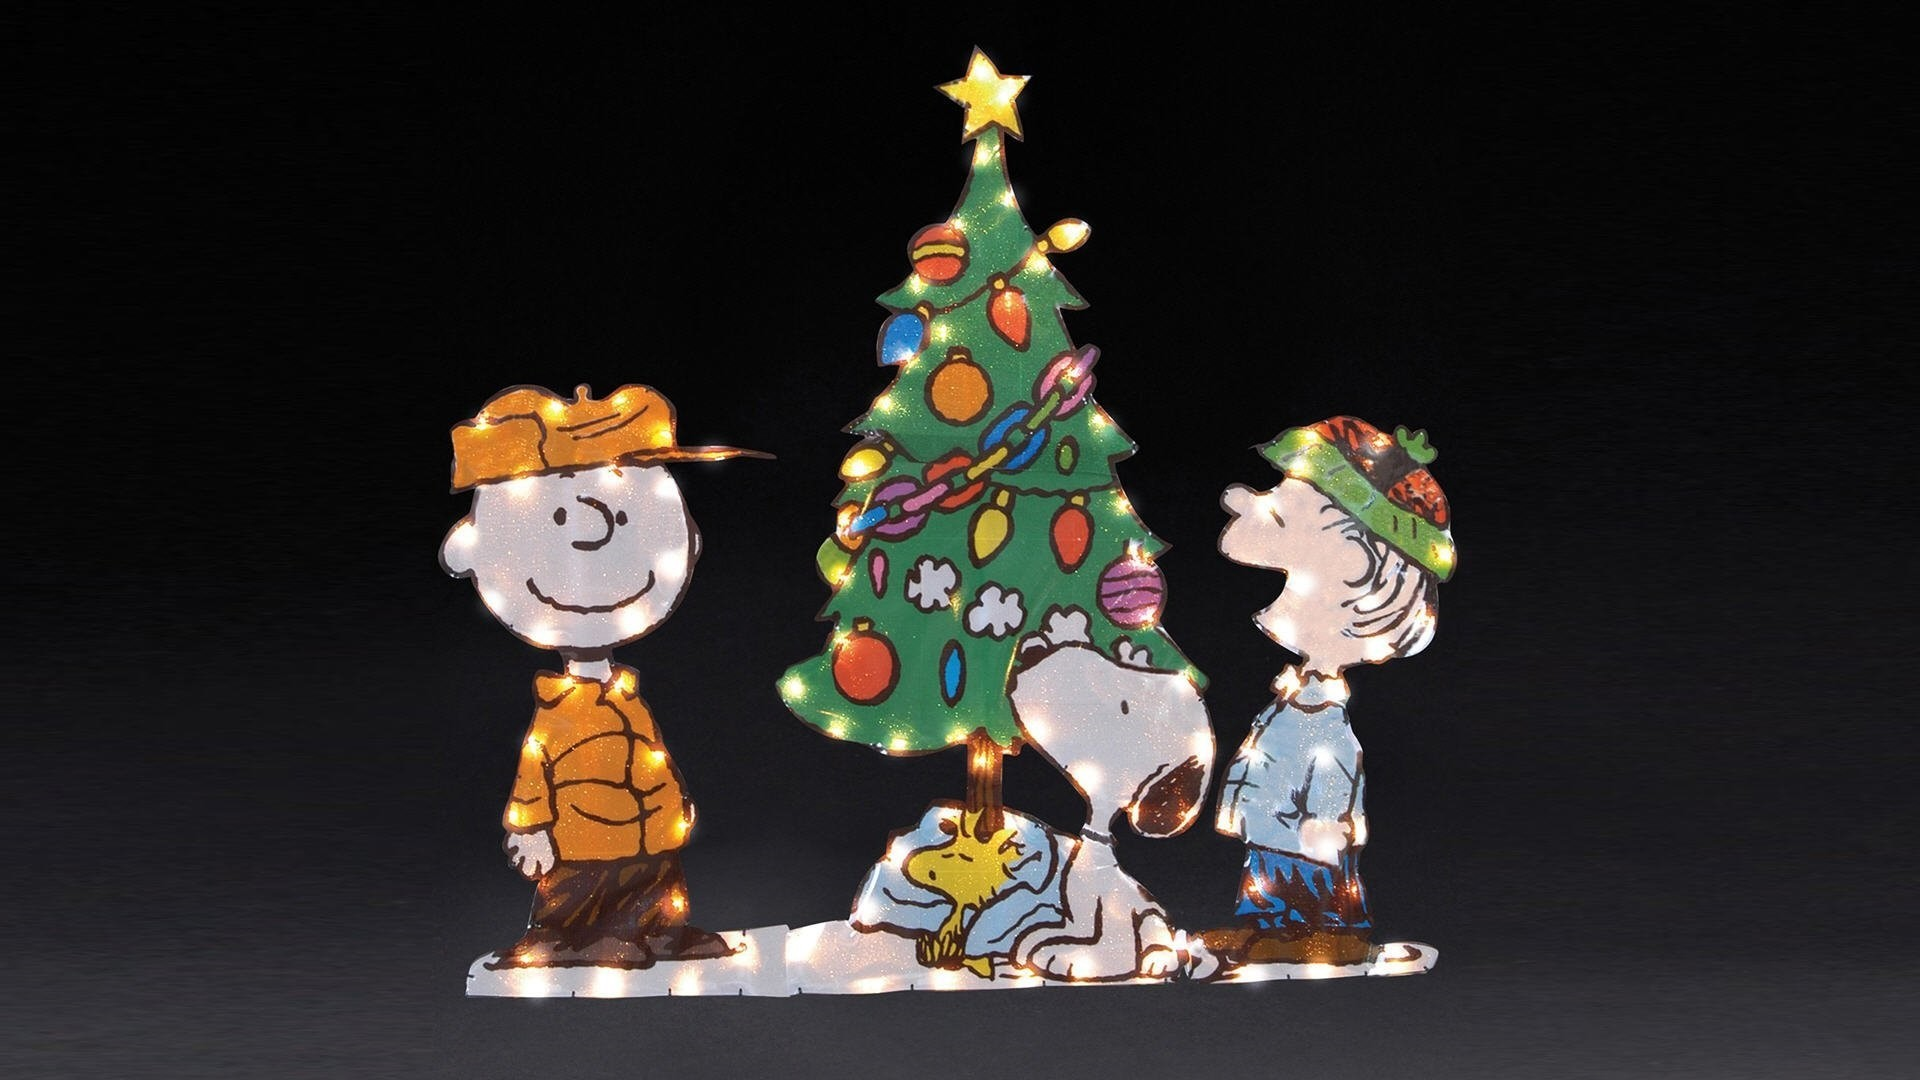 1920x1080 1920x1080 gallery of peanuts christmas wallpaper 8211 snoopy christmas tree wallpaper 2 - Snoopy Christmas Wallpaper